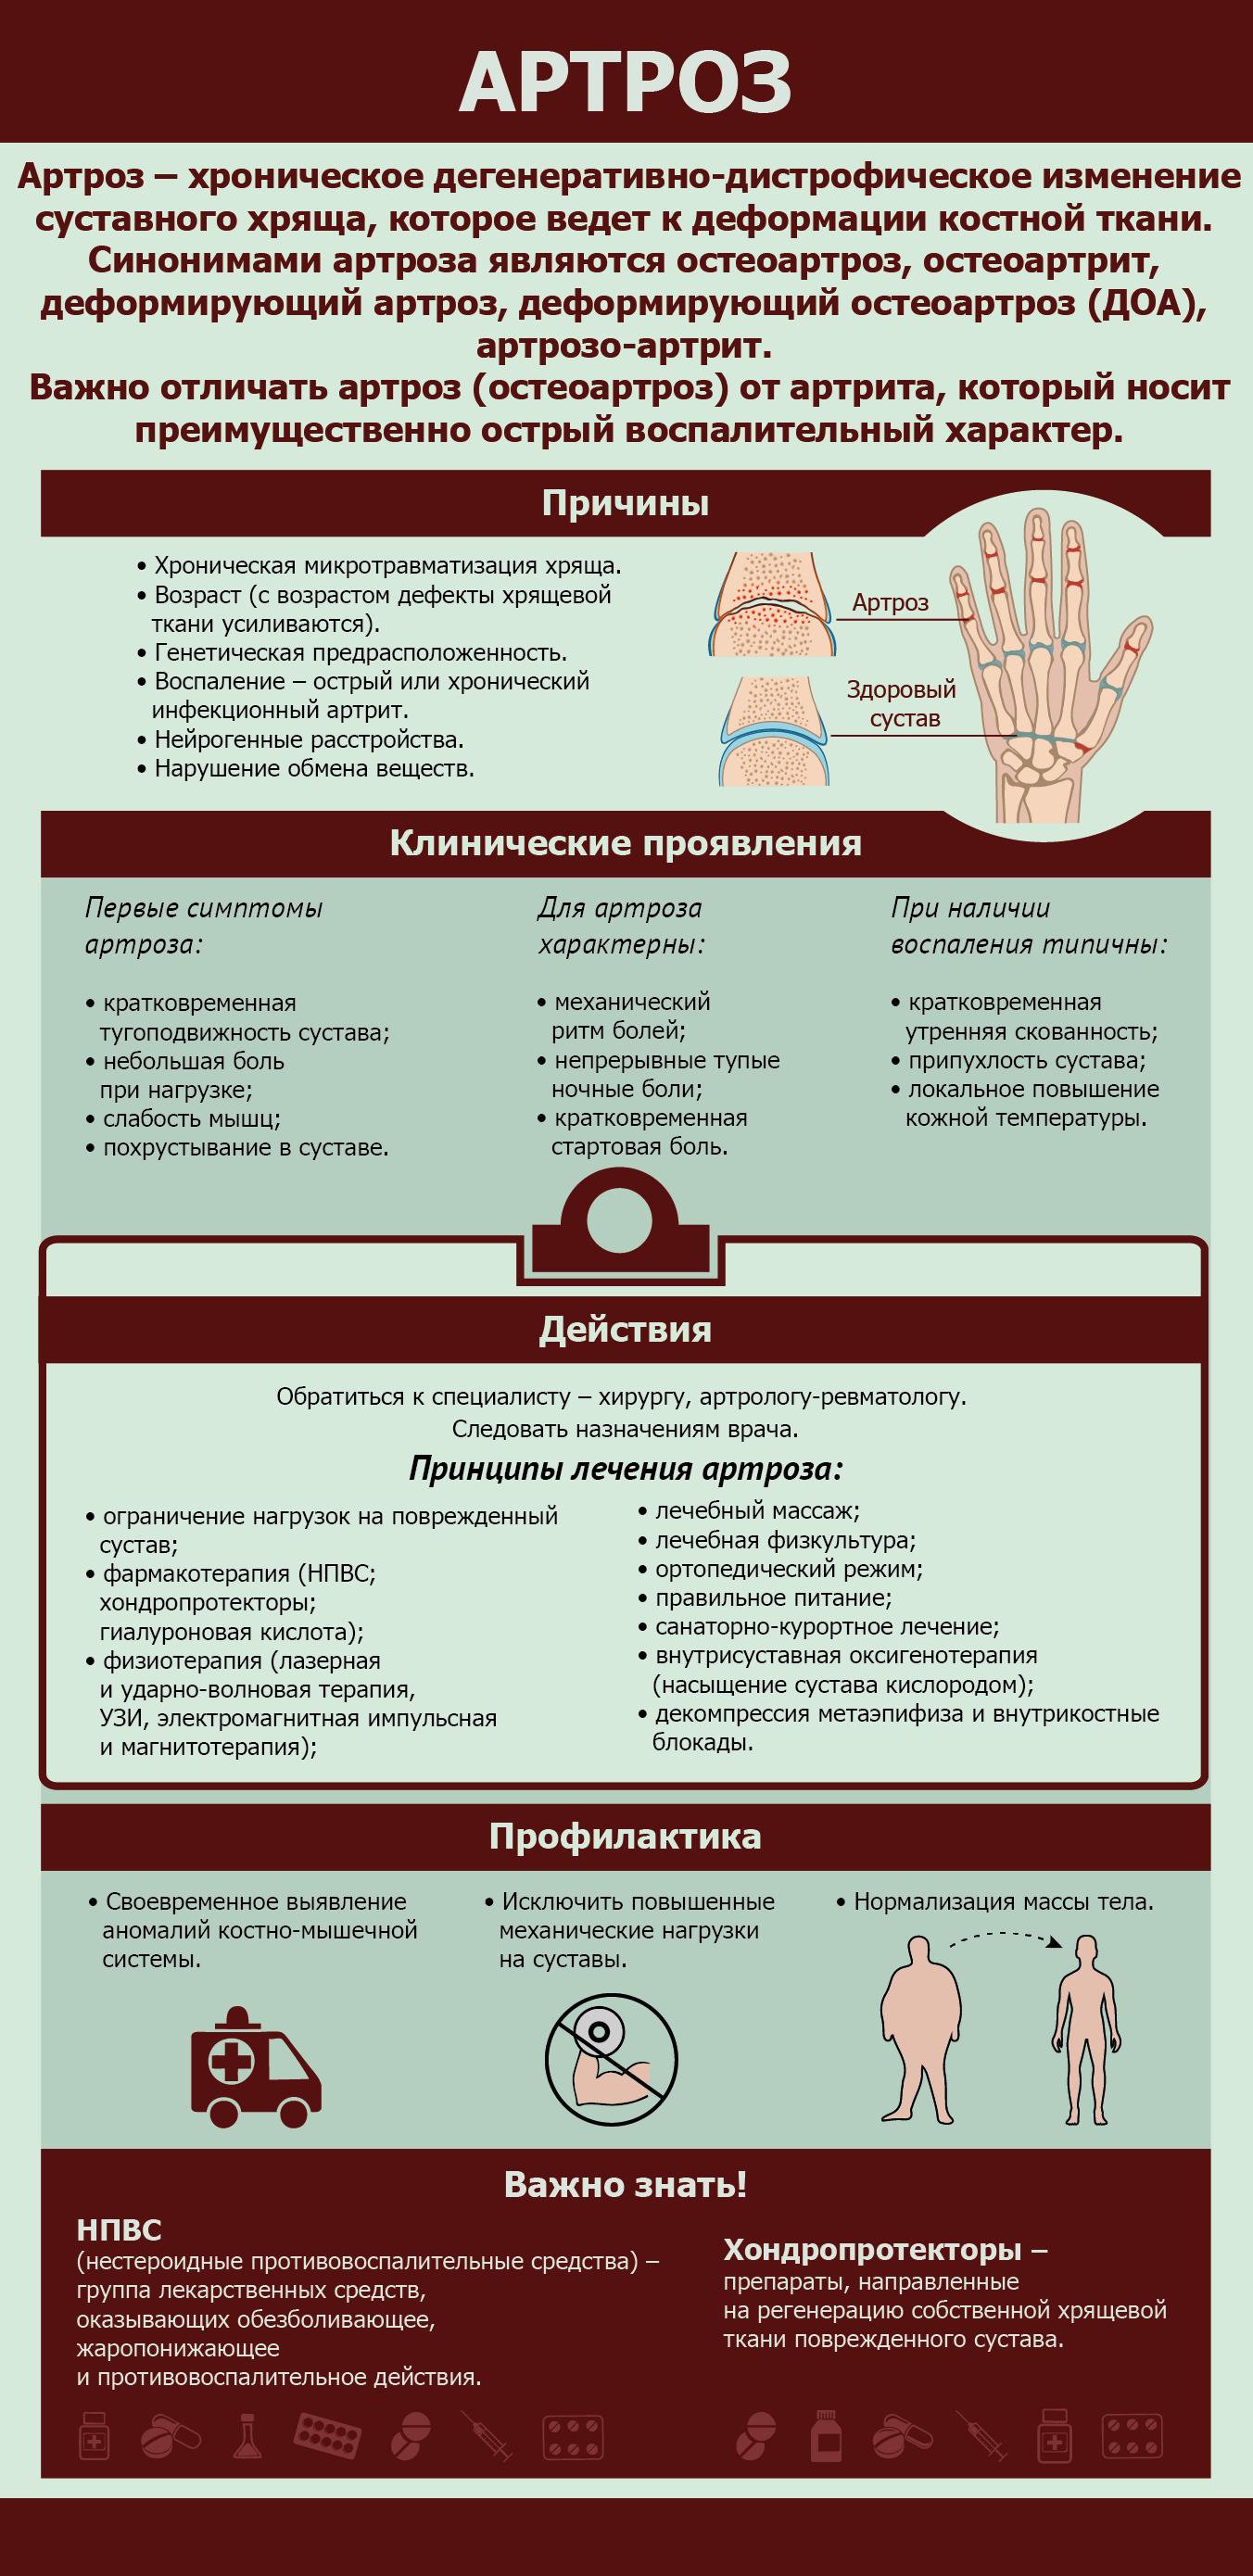 Факты о артрозе